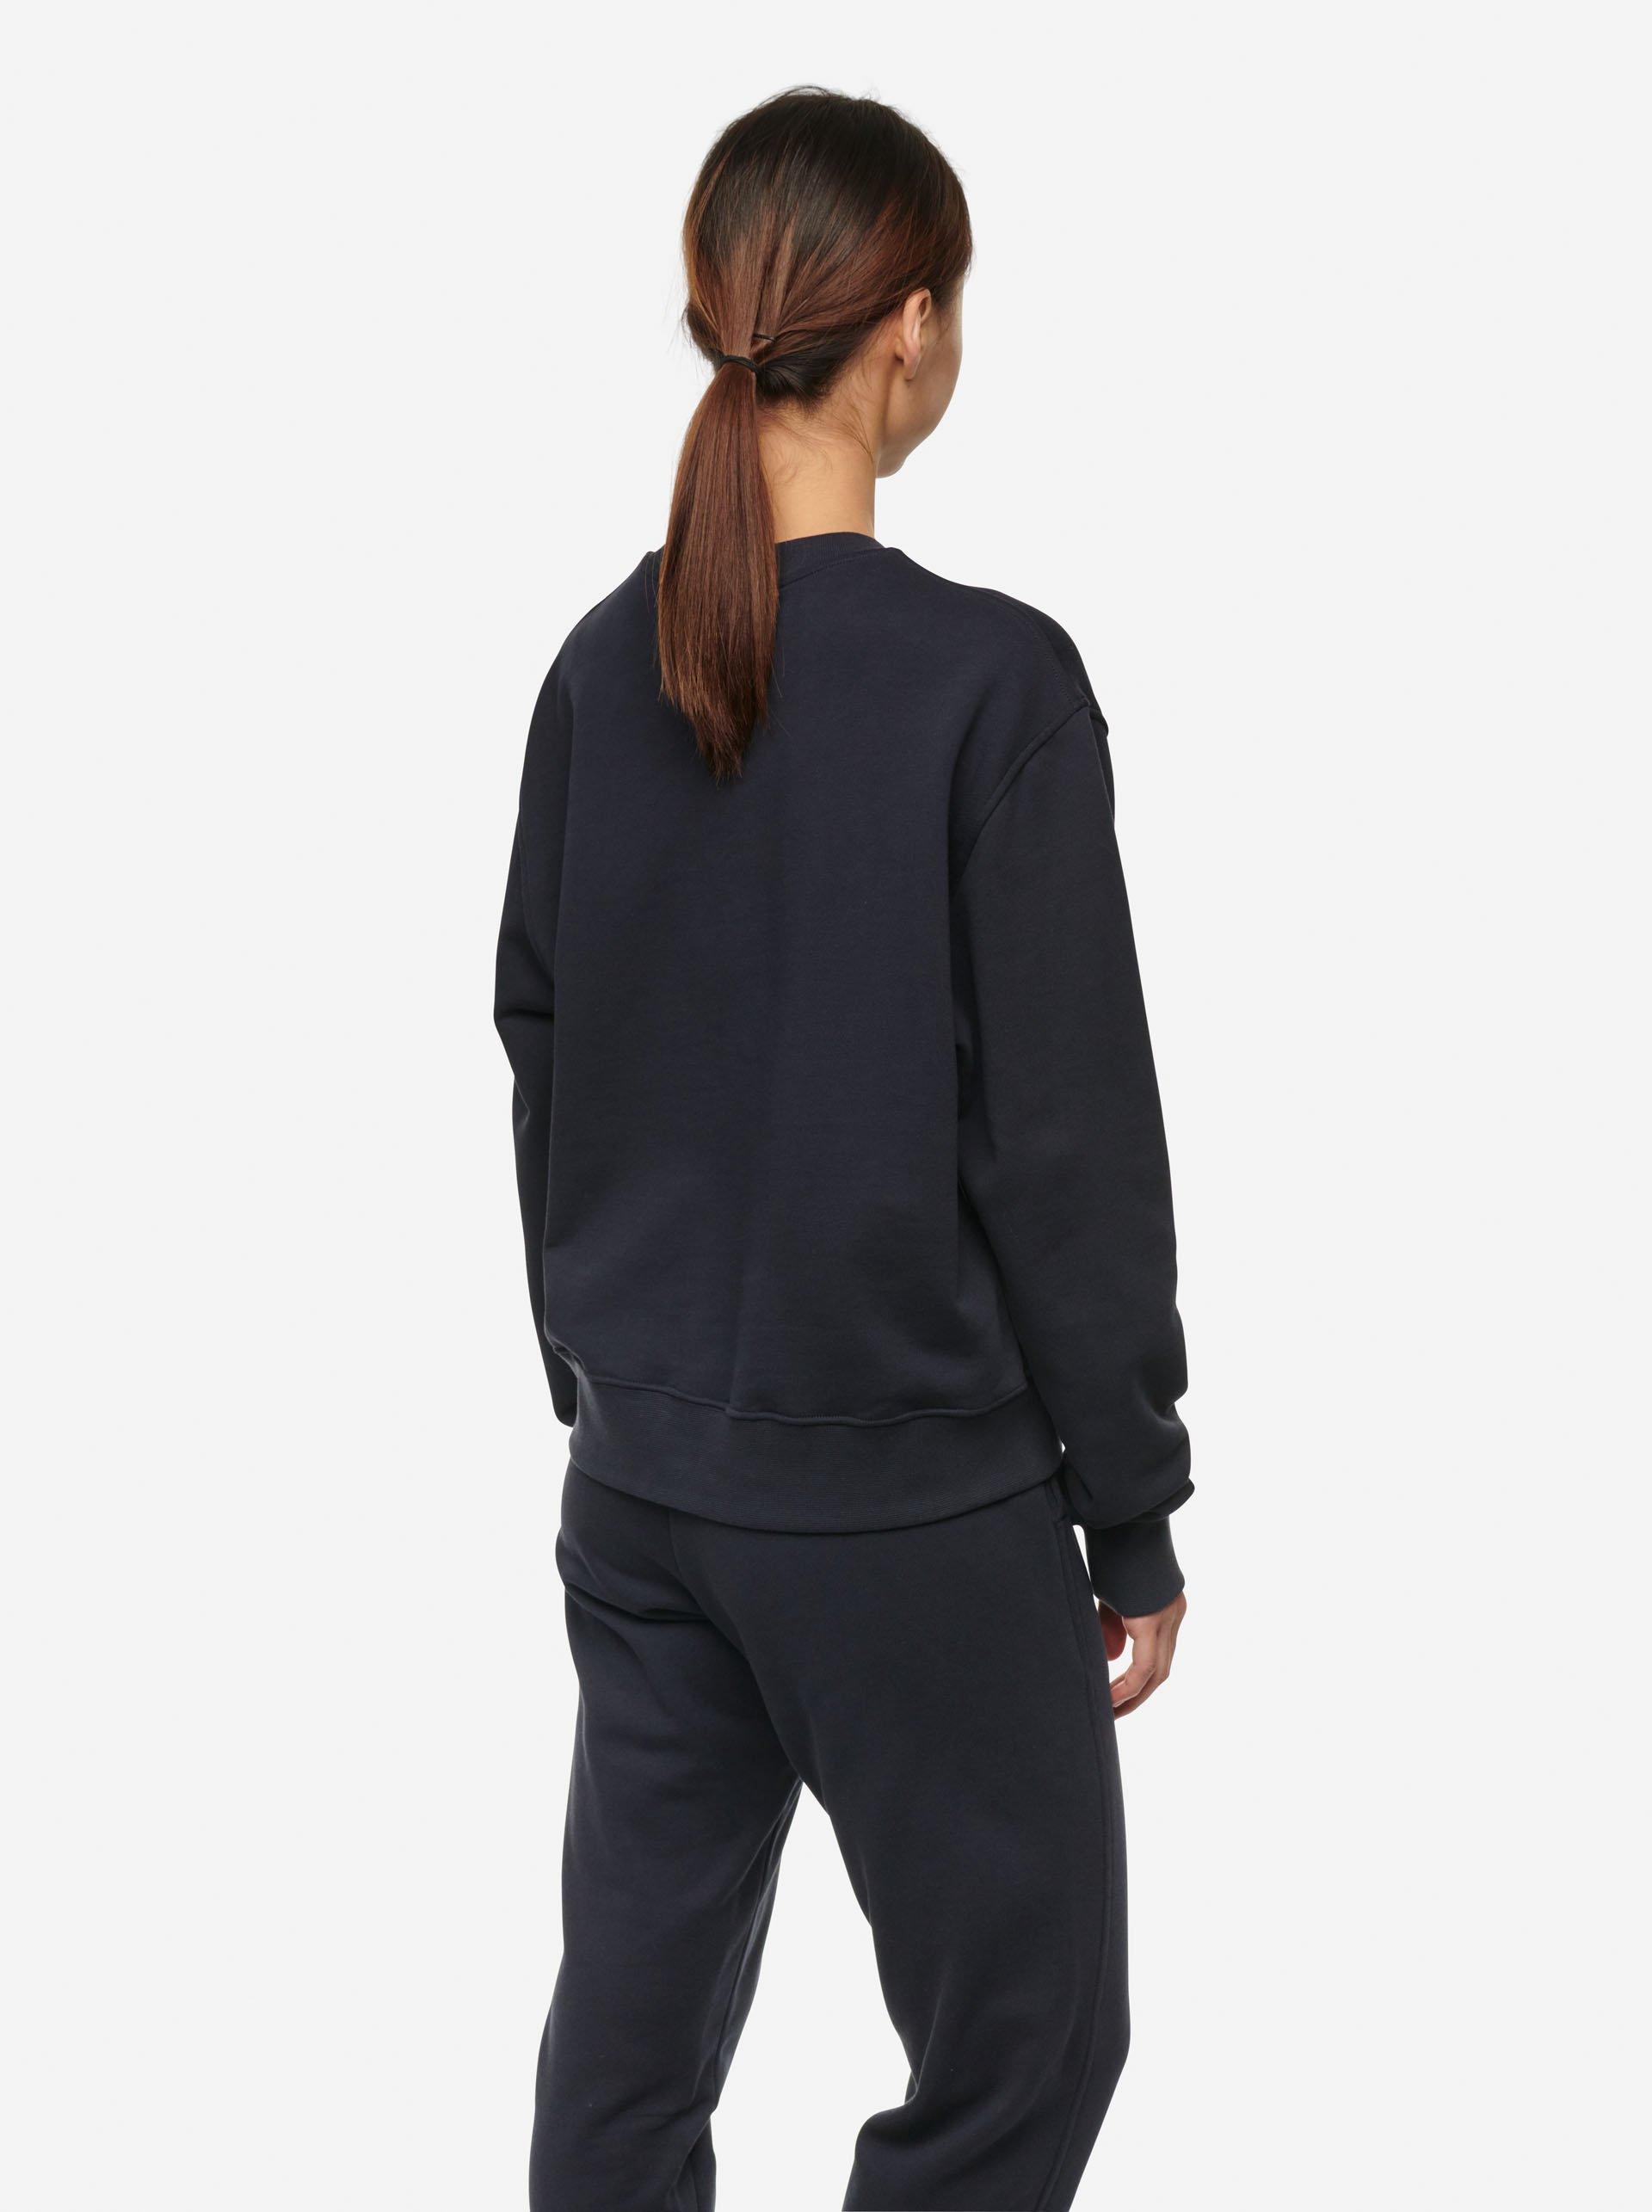 Teym-TheSweatshirt-Women-Blue04